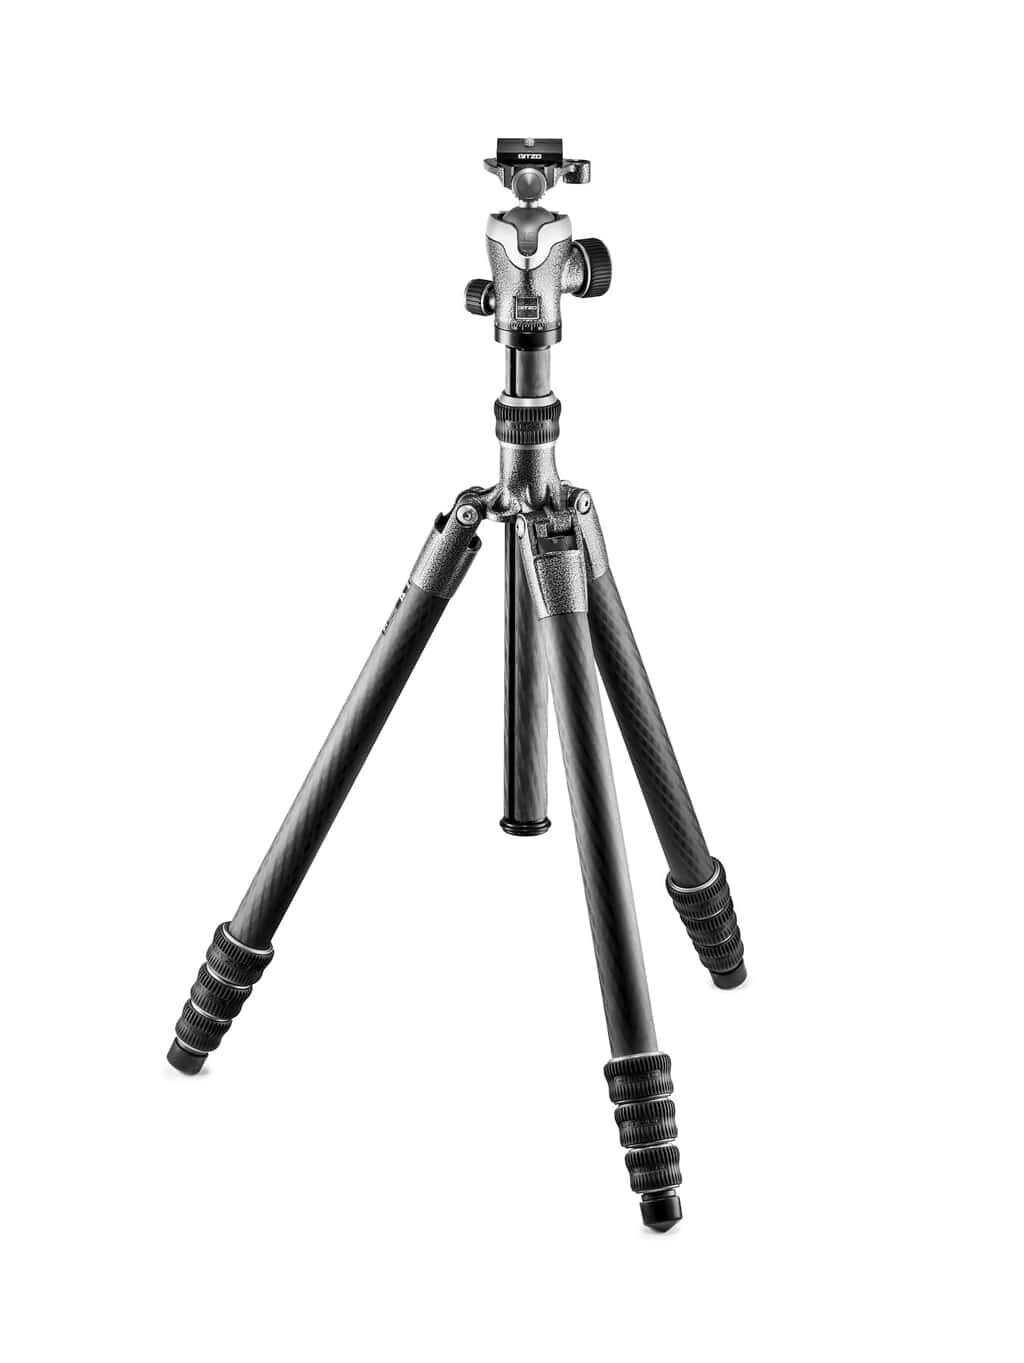 Gitzo GK2545T-82QD Traveler Stativ Kit, Serie 2, 4 Beinsegmente